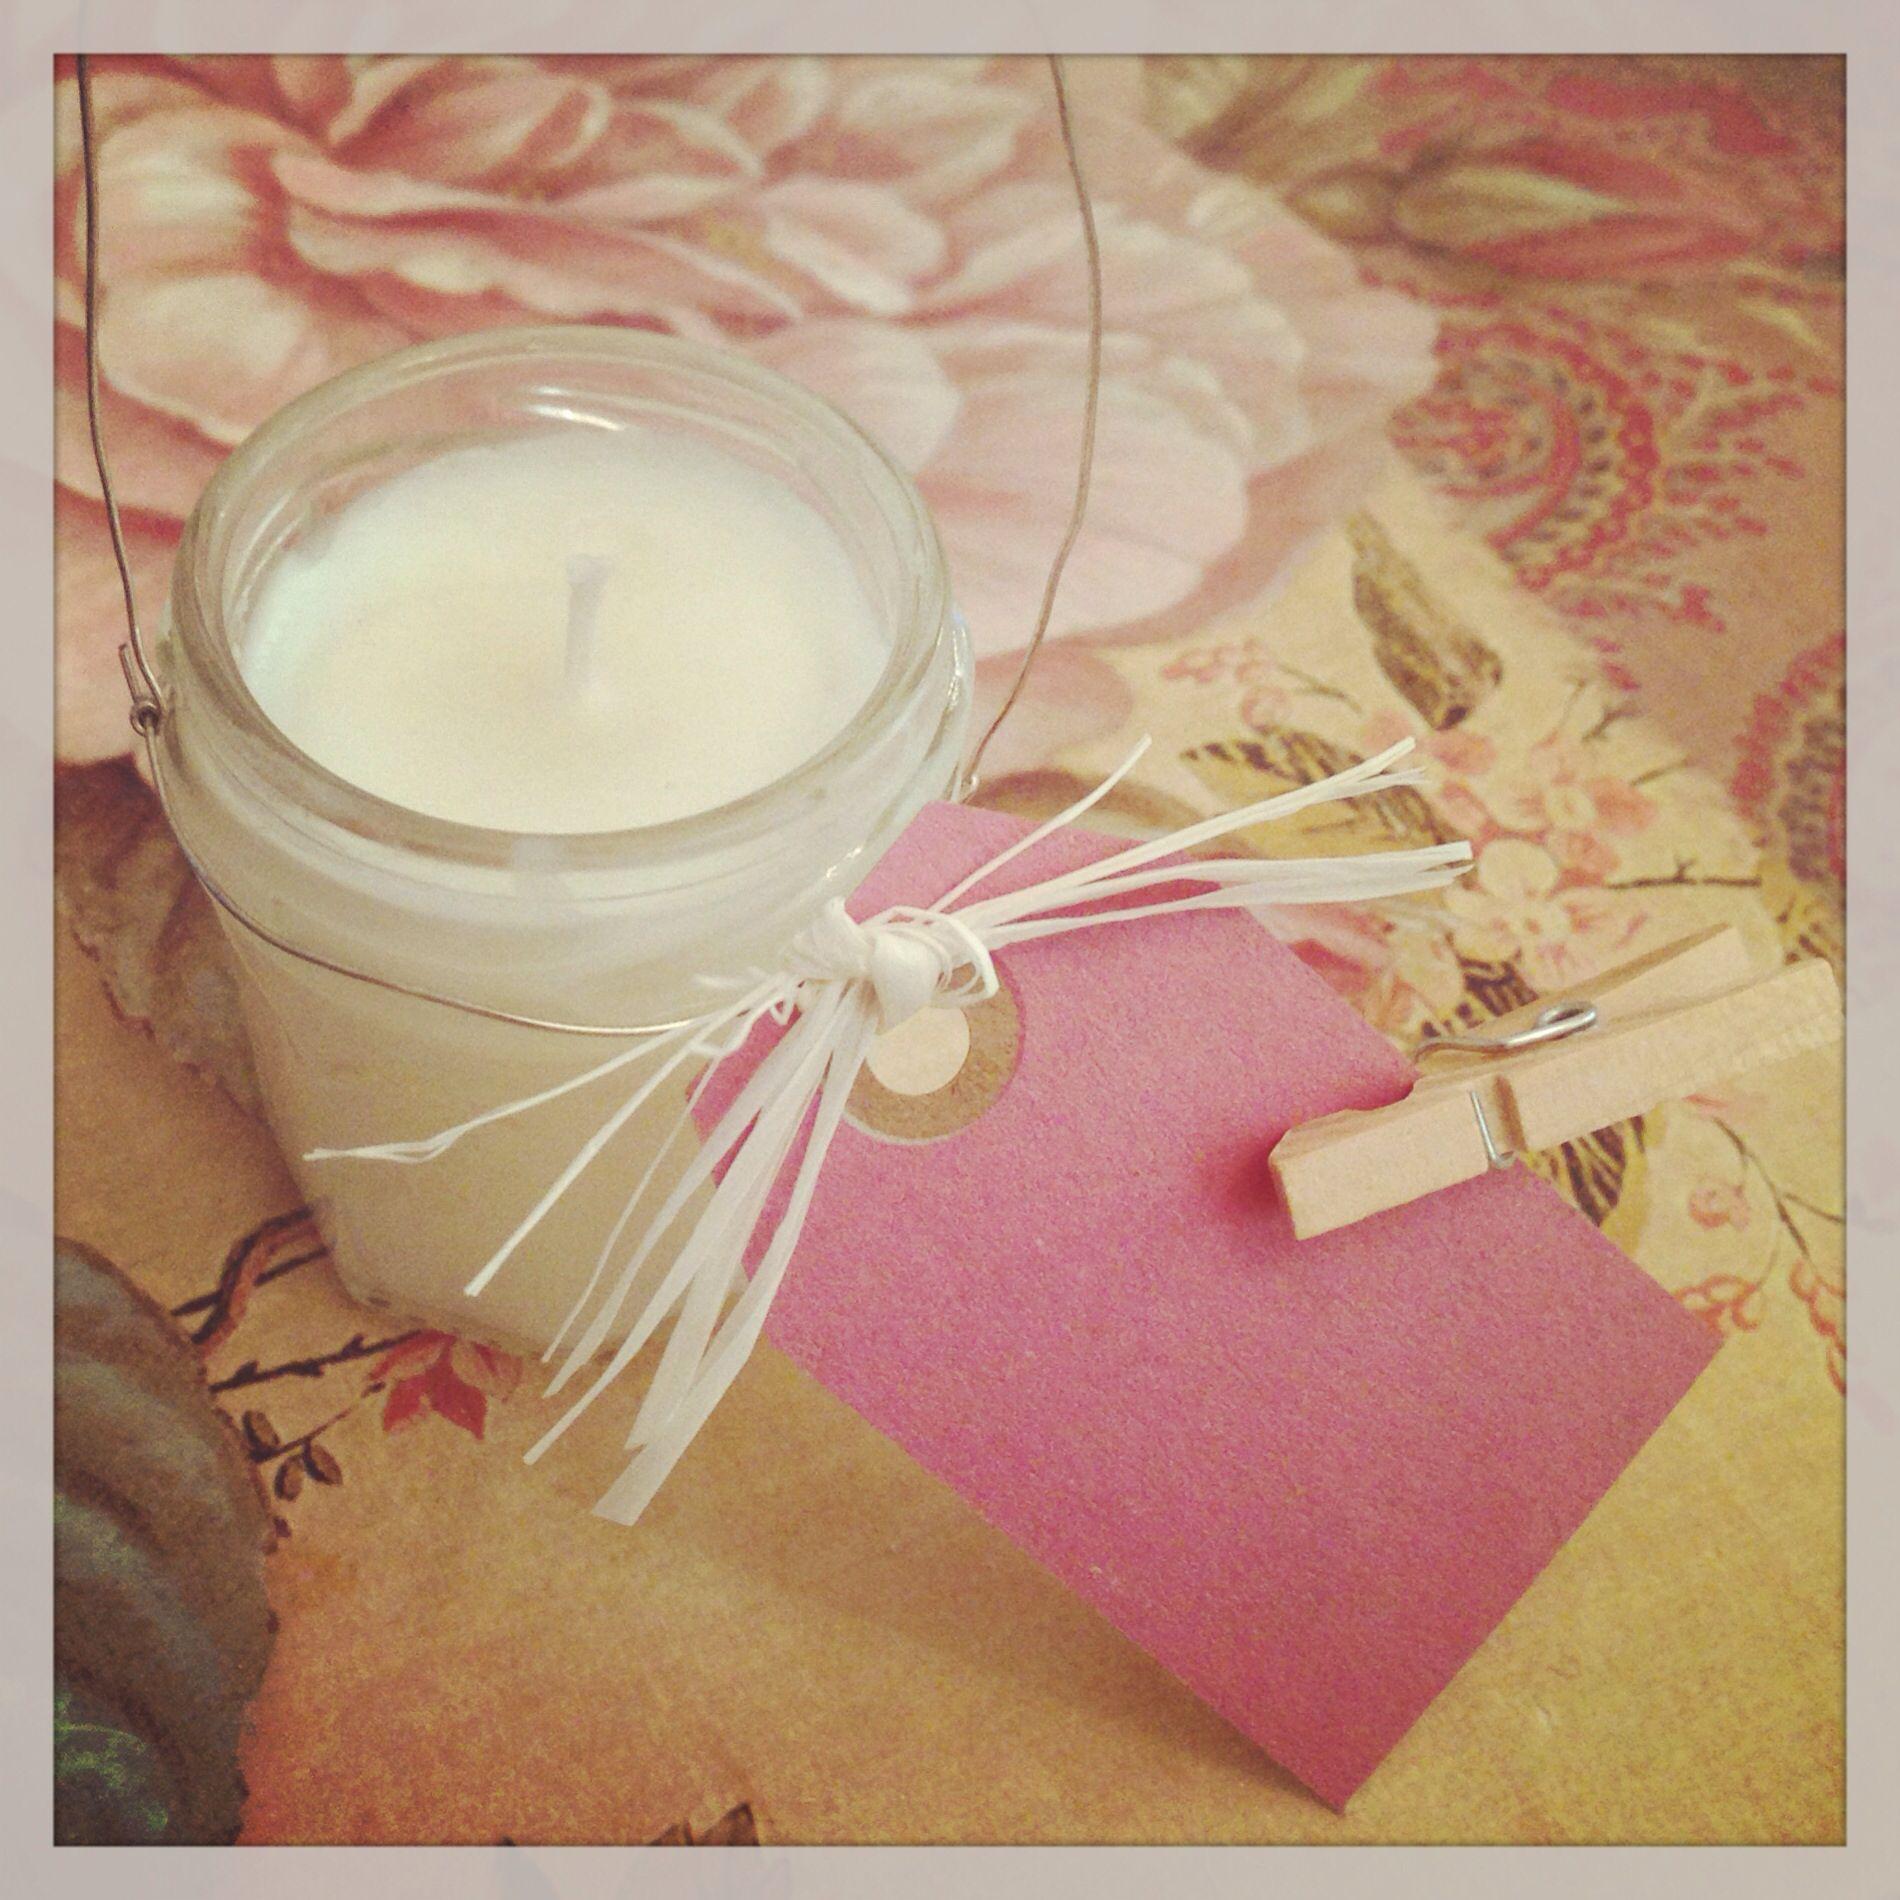 Cute mini jam jar candle | Handmade wedding favours | Pinterest ...